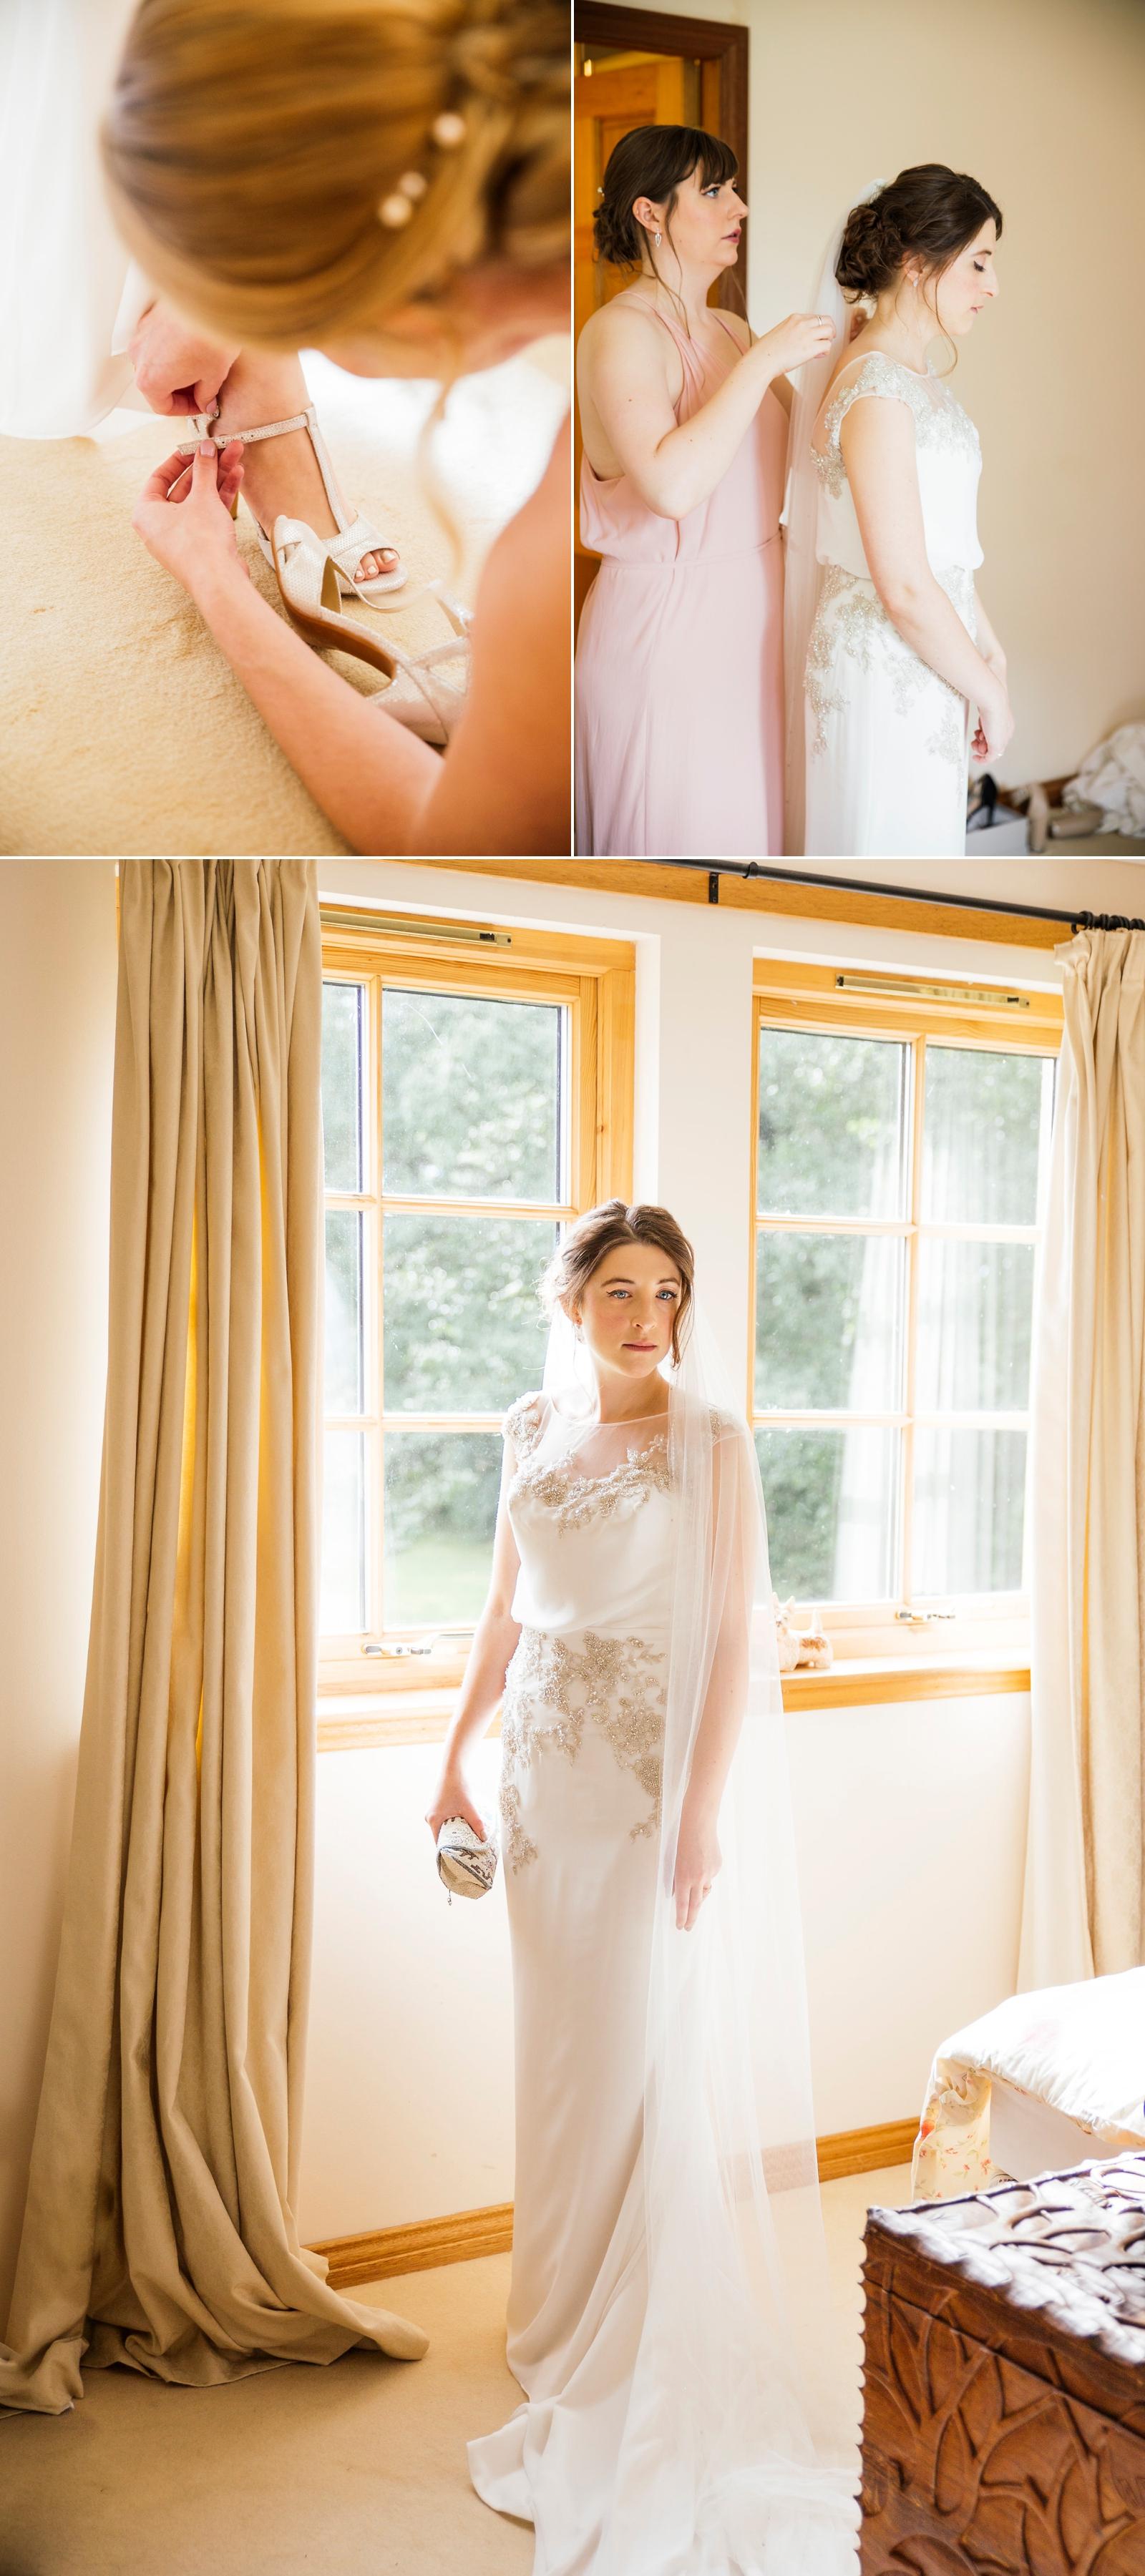 2016-09-24-MadeleineandFinlaybyCerannaPhotography_MG_0512.jpg